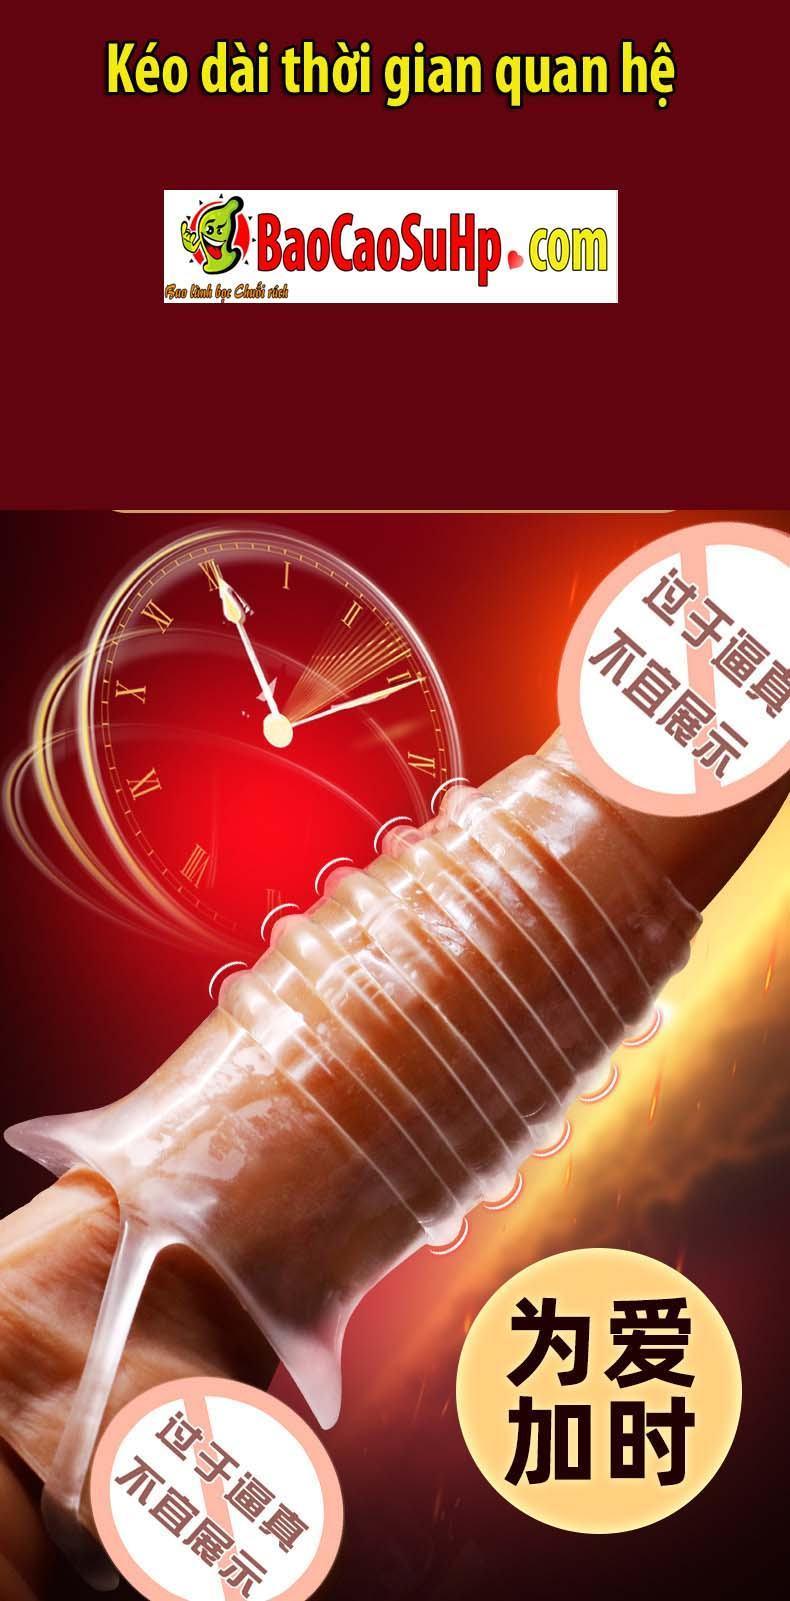 20200418214330 4643077 bao cao su invisible crybe gan noi trong suot 6 1 - Tất tần tật mọi thứ về bao cao su chính hãng tại Hải Phòng.